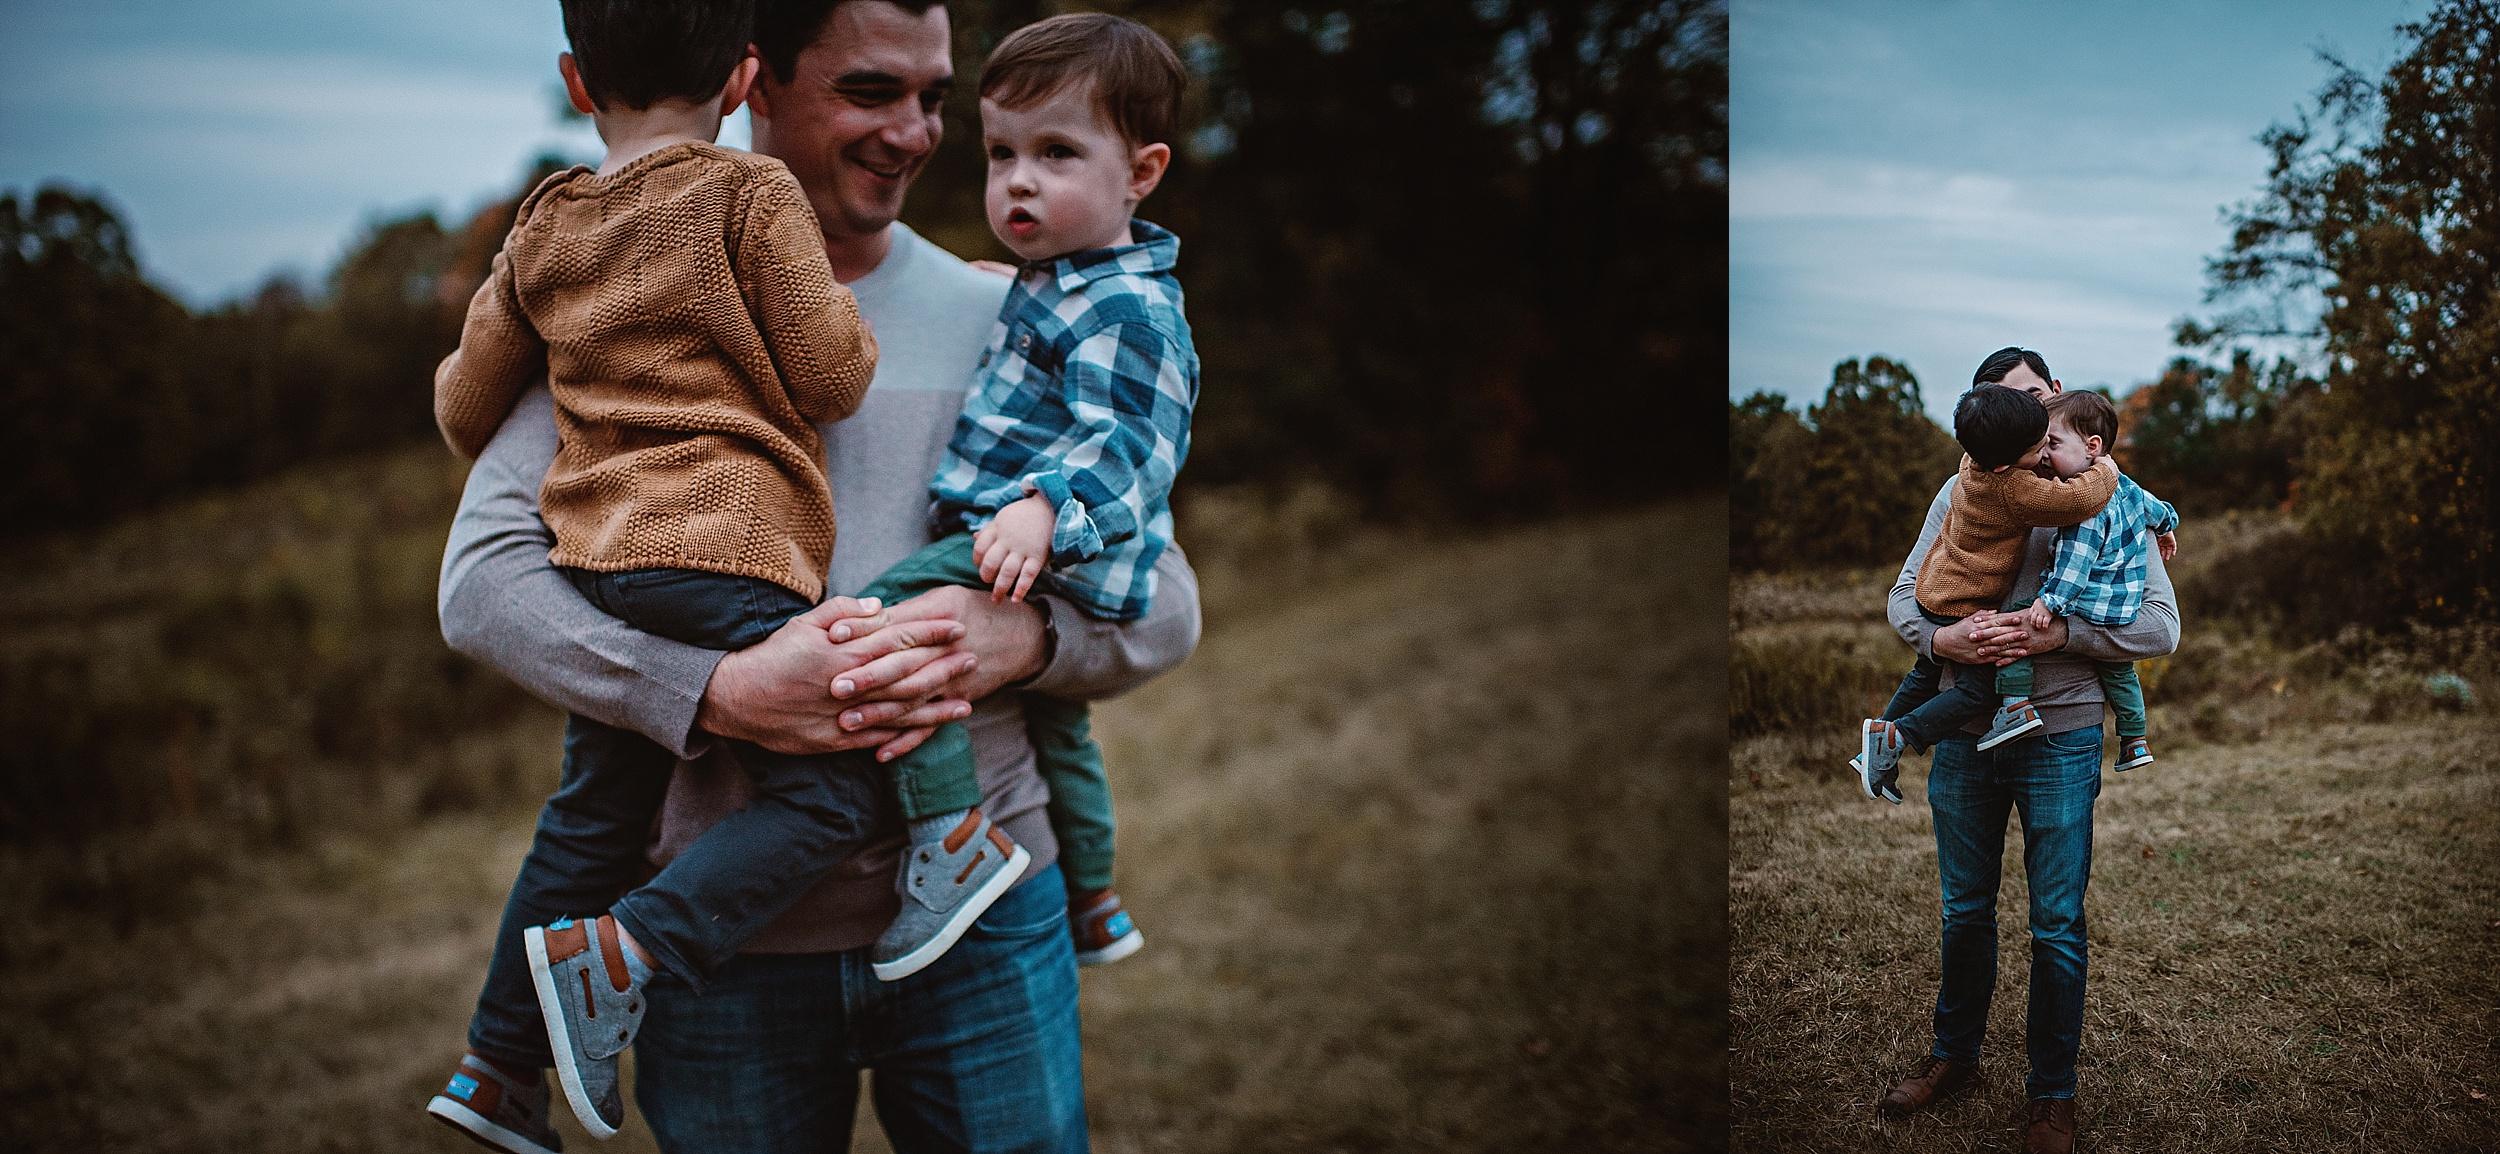 lauren-grayson-photography-portrait-artist-akron-cleveland-ohio-photographer-family-session-fields-sunset-fall_0219.jpg